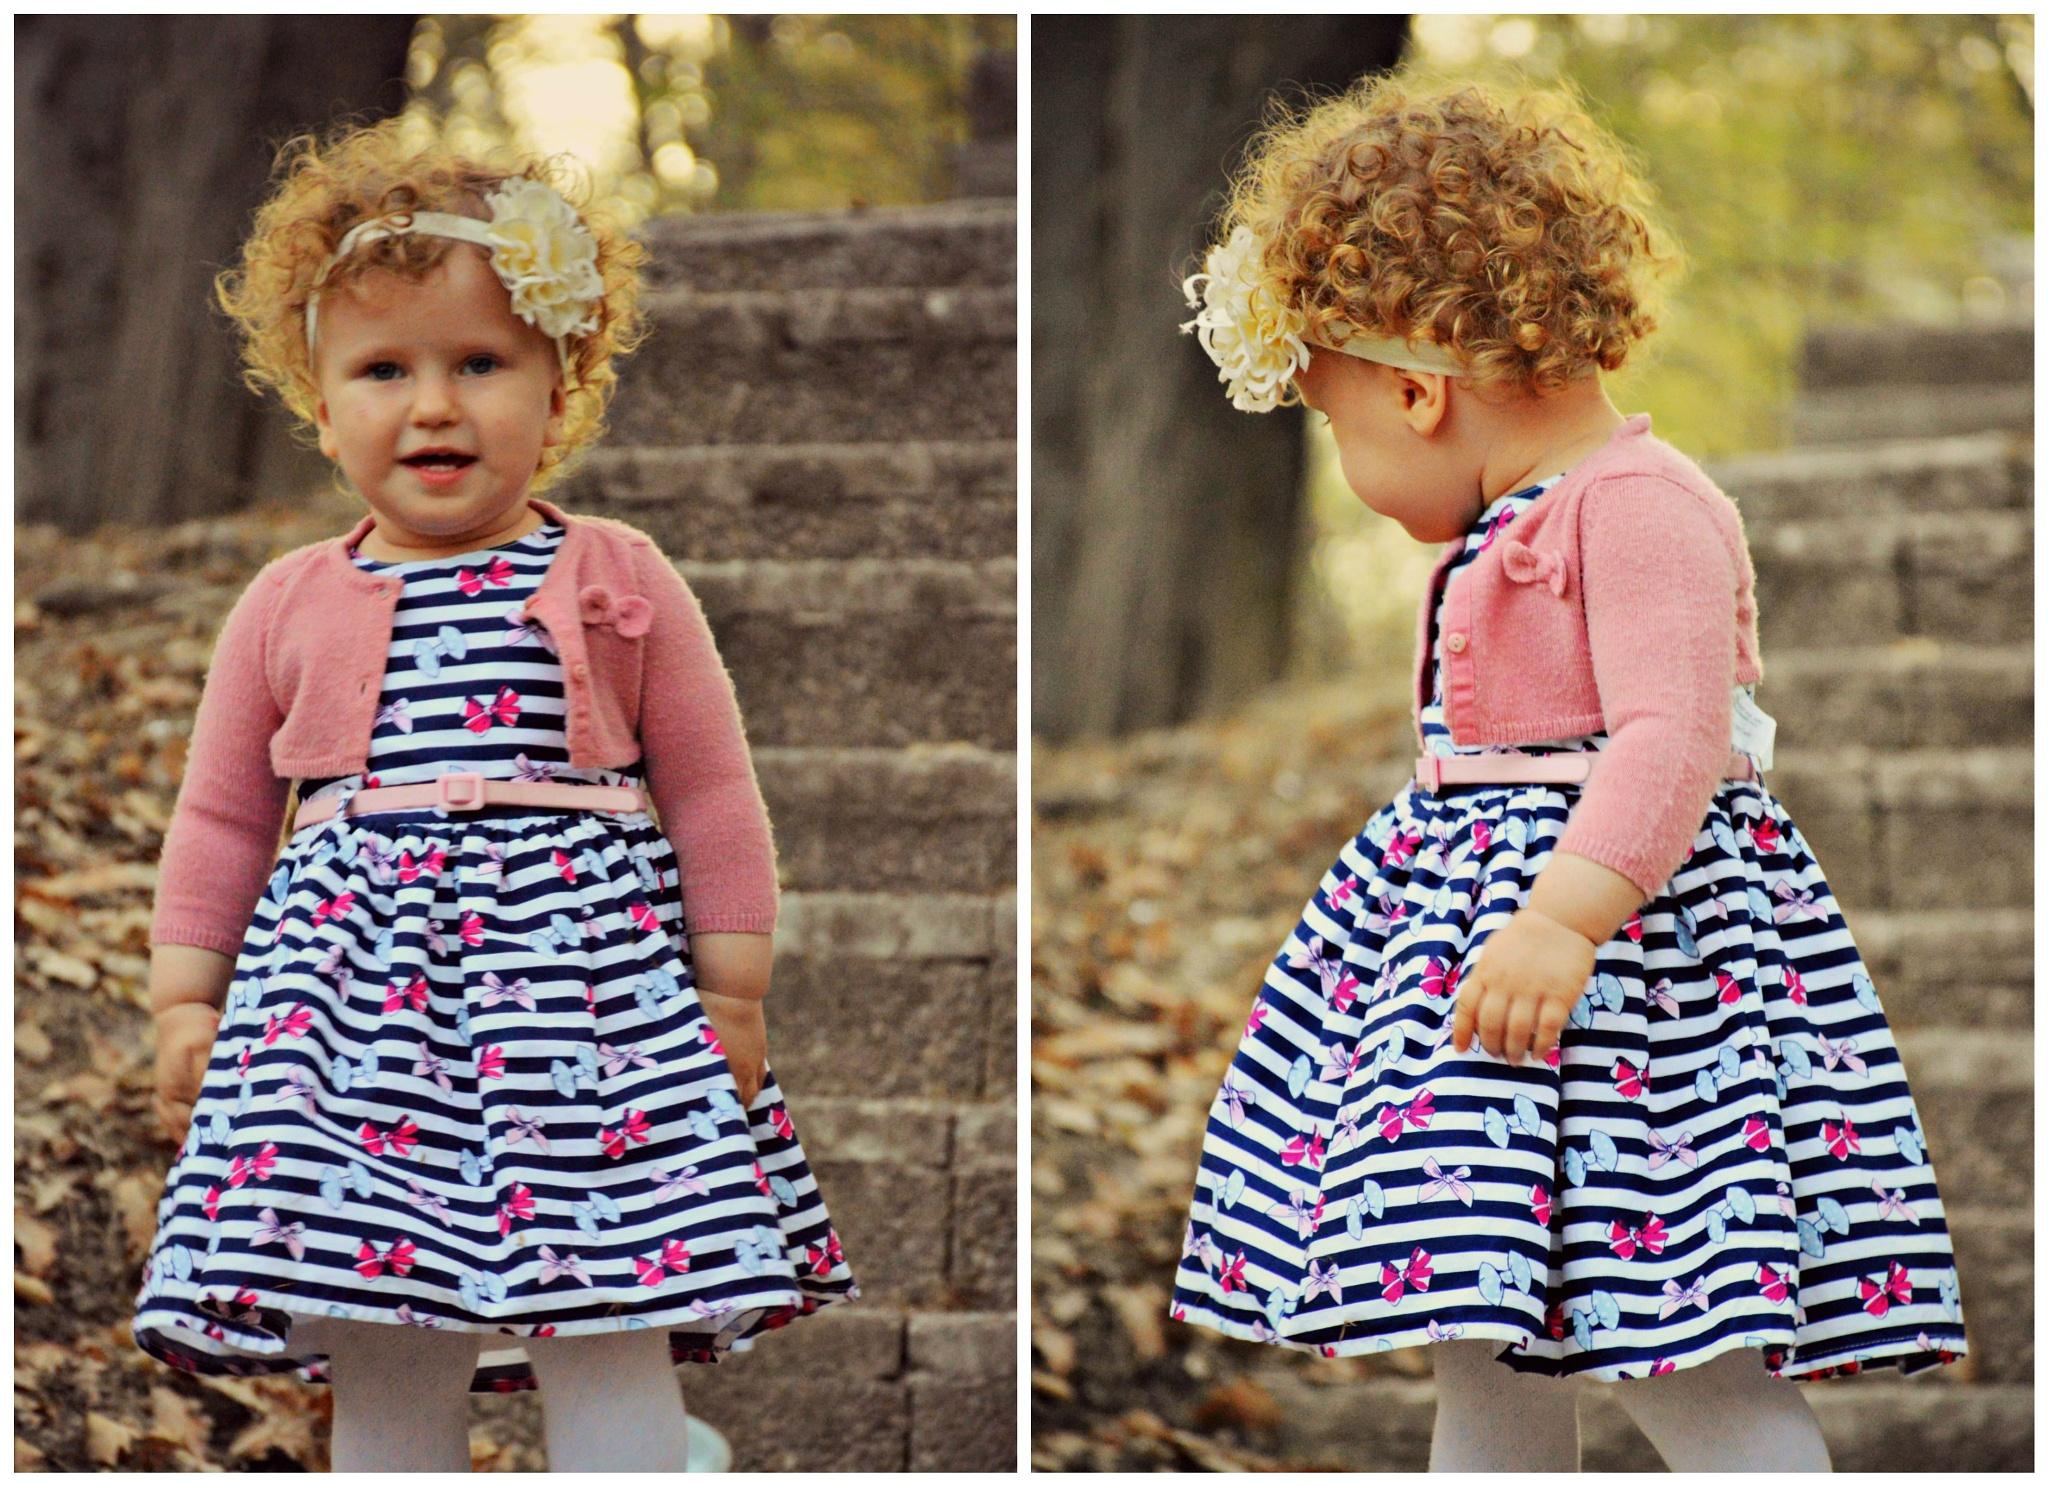 Princess with curly hair by Adelina Jinga